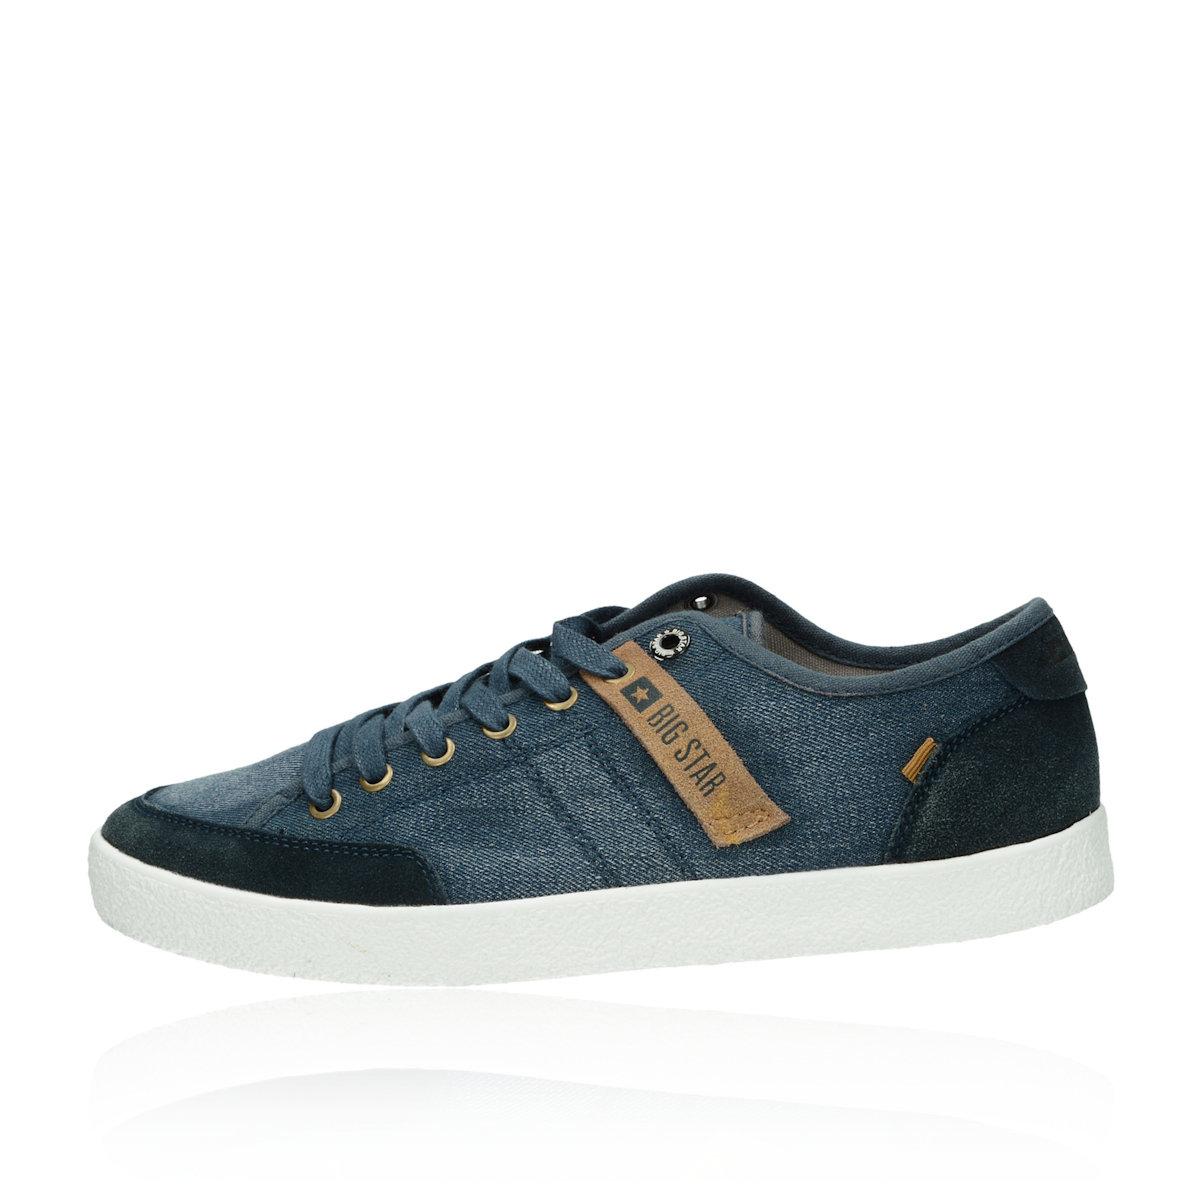 864d1e97420 Big Star pánske textilné tenisky - modré